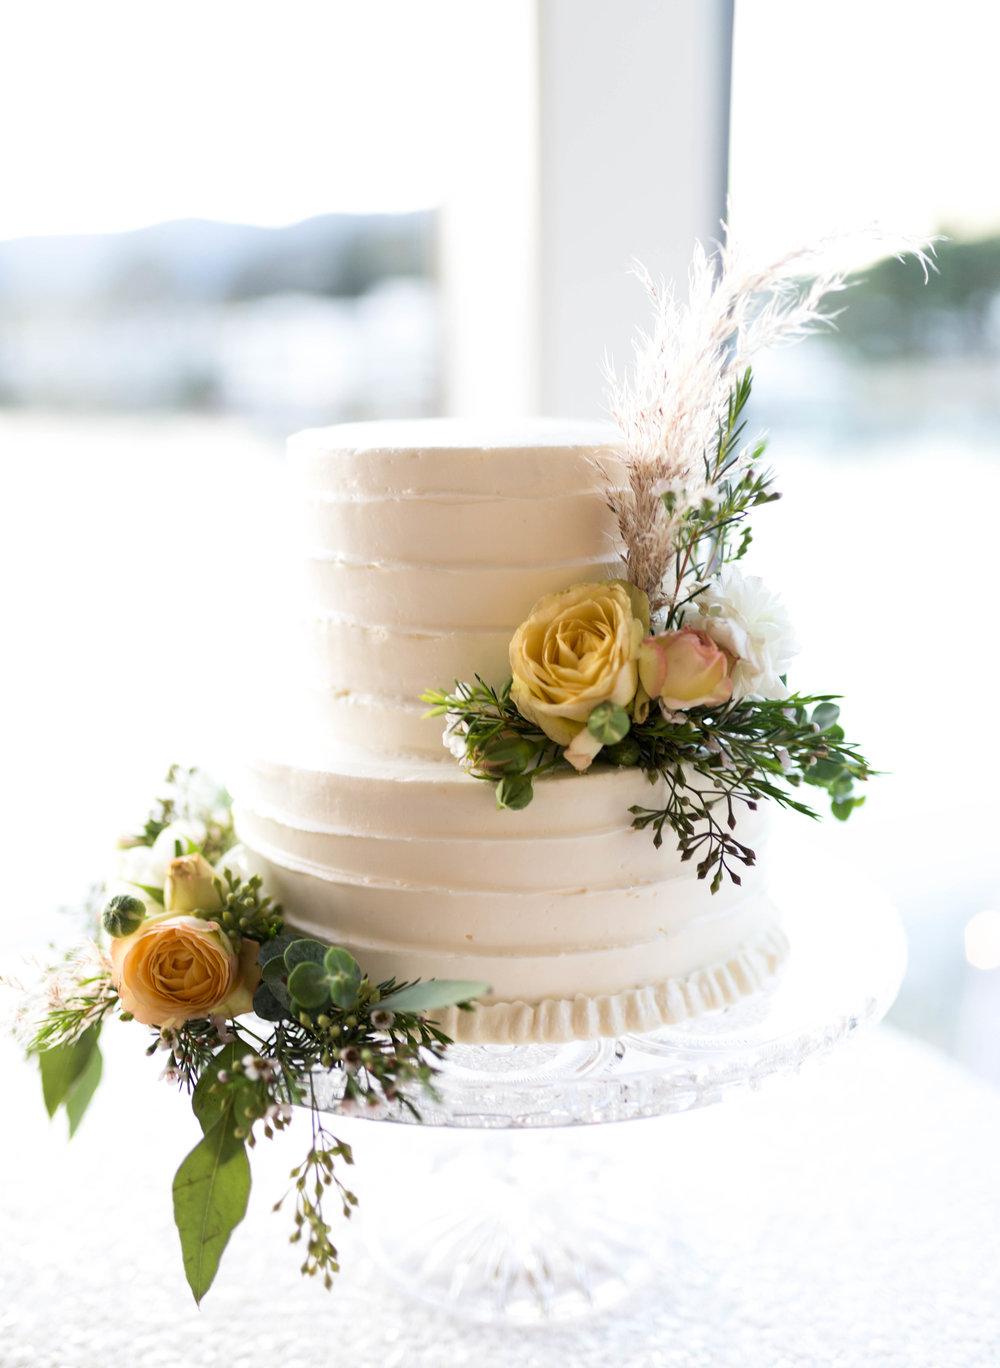 Sweetheart Cake with Wild Northern California Bohemian Wedding | Cake Bloom, Sonoma, California | FarmGirl Flowers | Jillian Gorman Photography